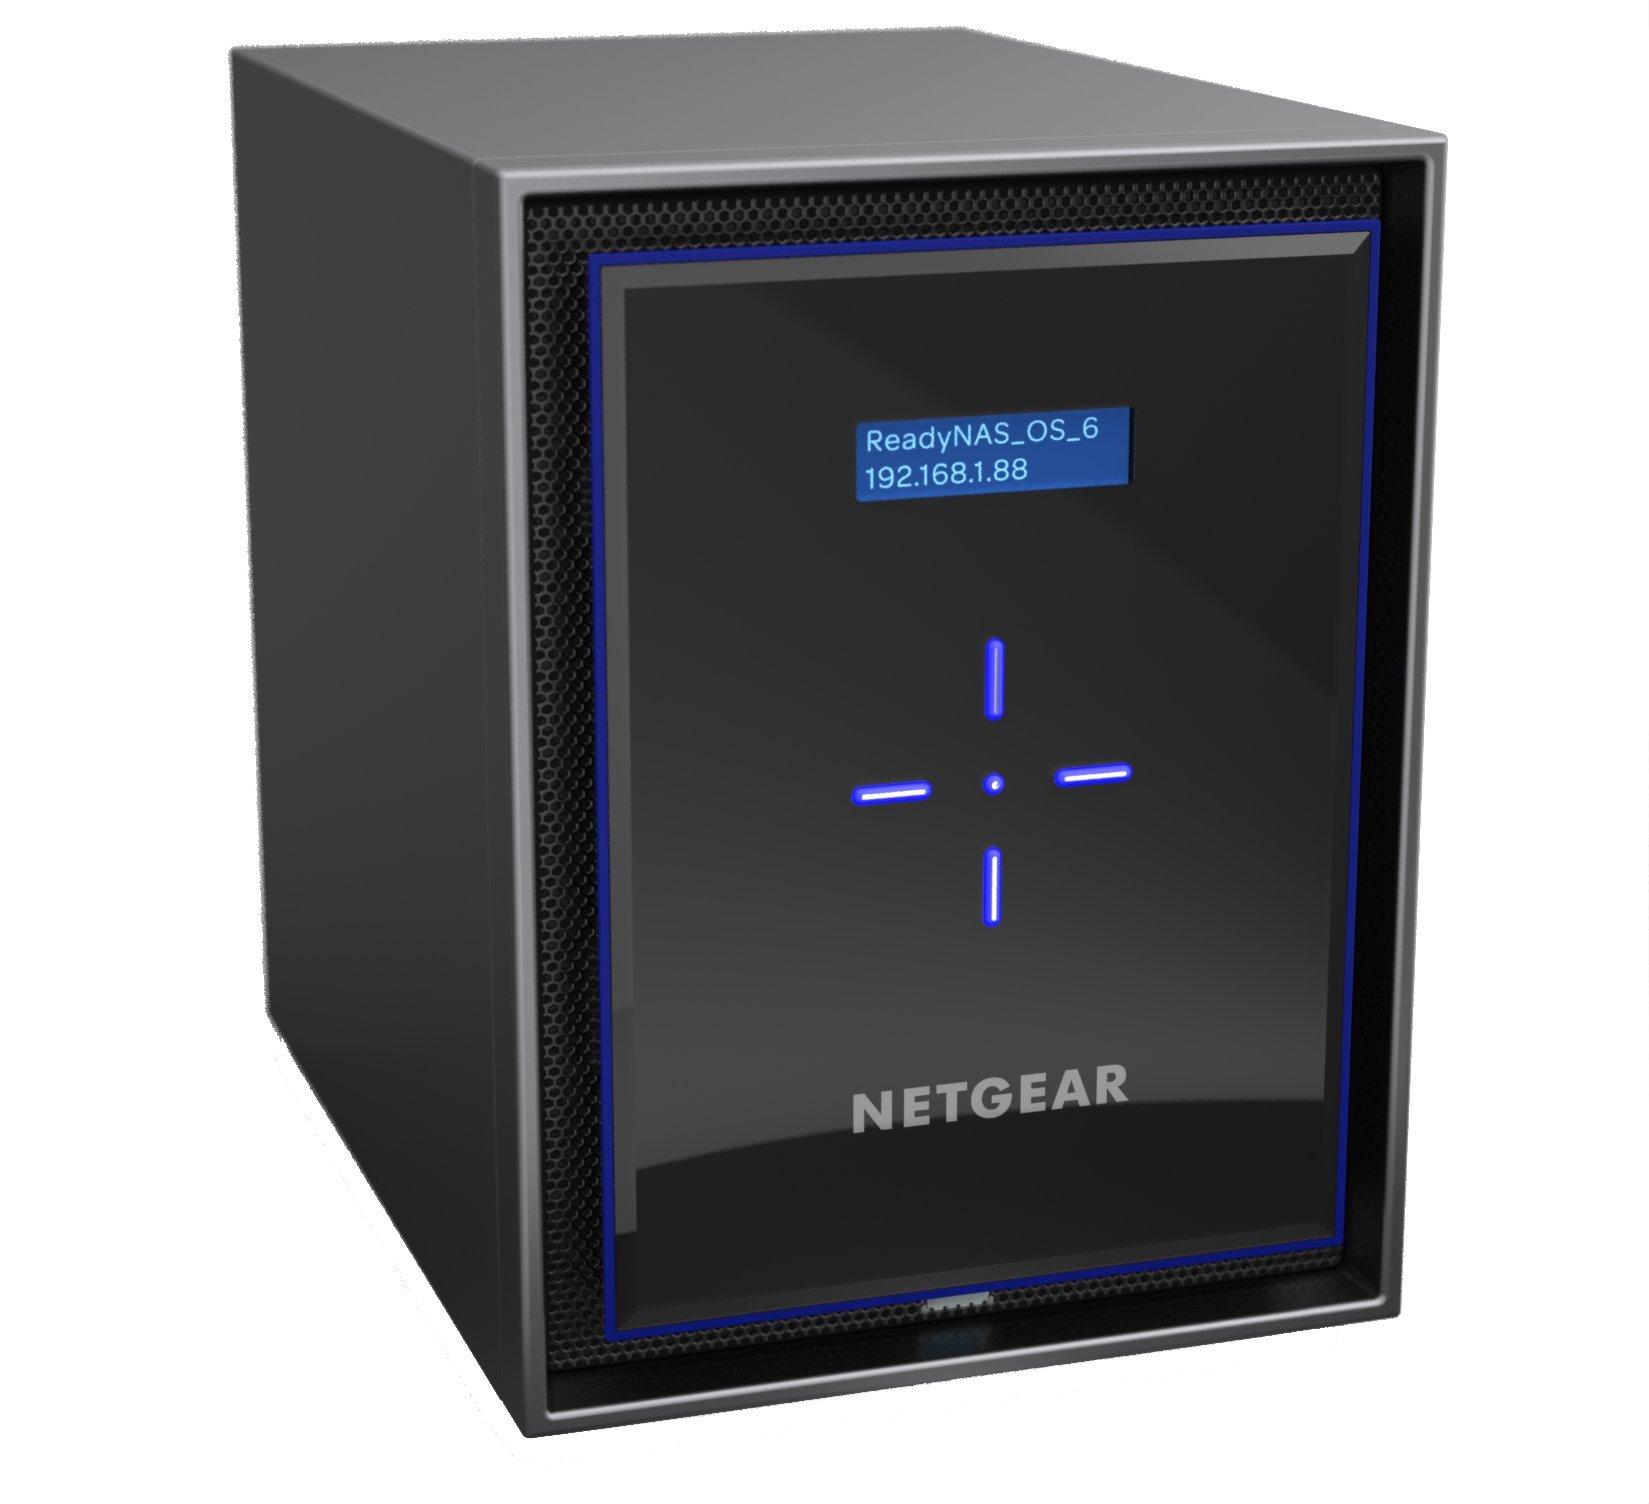 NETGEAR ReadyNAS RN426 6 Bay Diskless High Performance NAS, 60TB Capacity Network Attached Storage, Intel 2.1GHz Quad Core Processor, 4GB RAM, (RN42600) by NETGEAR